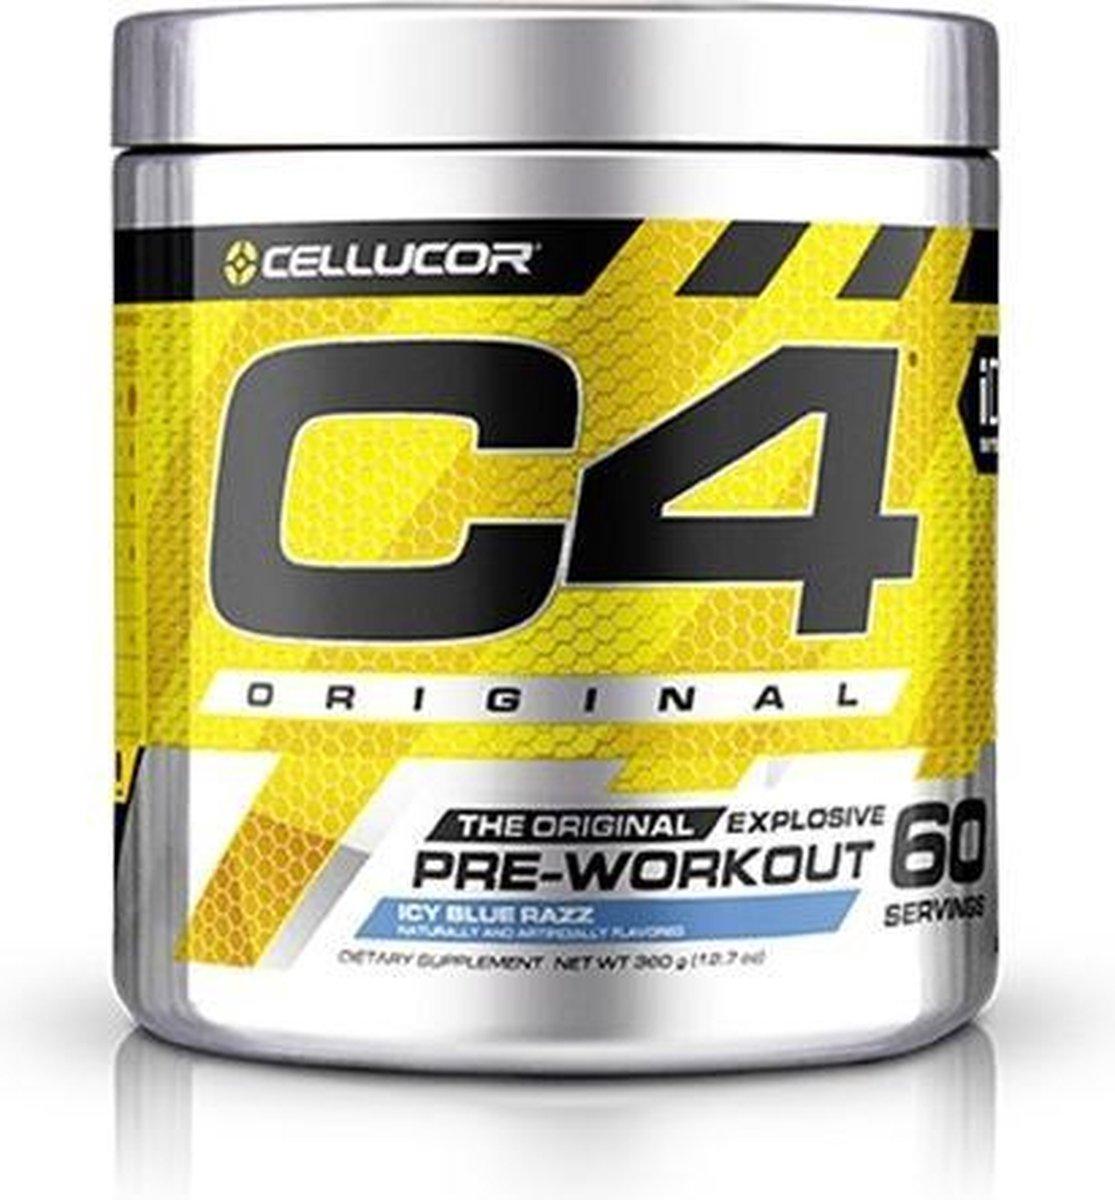 Cellucor C4 Original Pre-Workout - 60 Doseringen - Watermelon